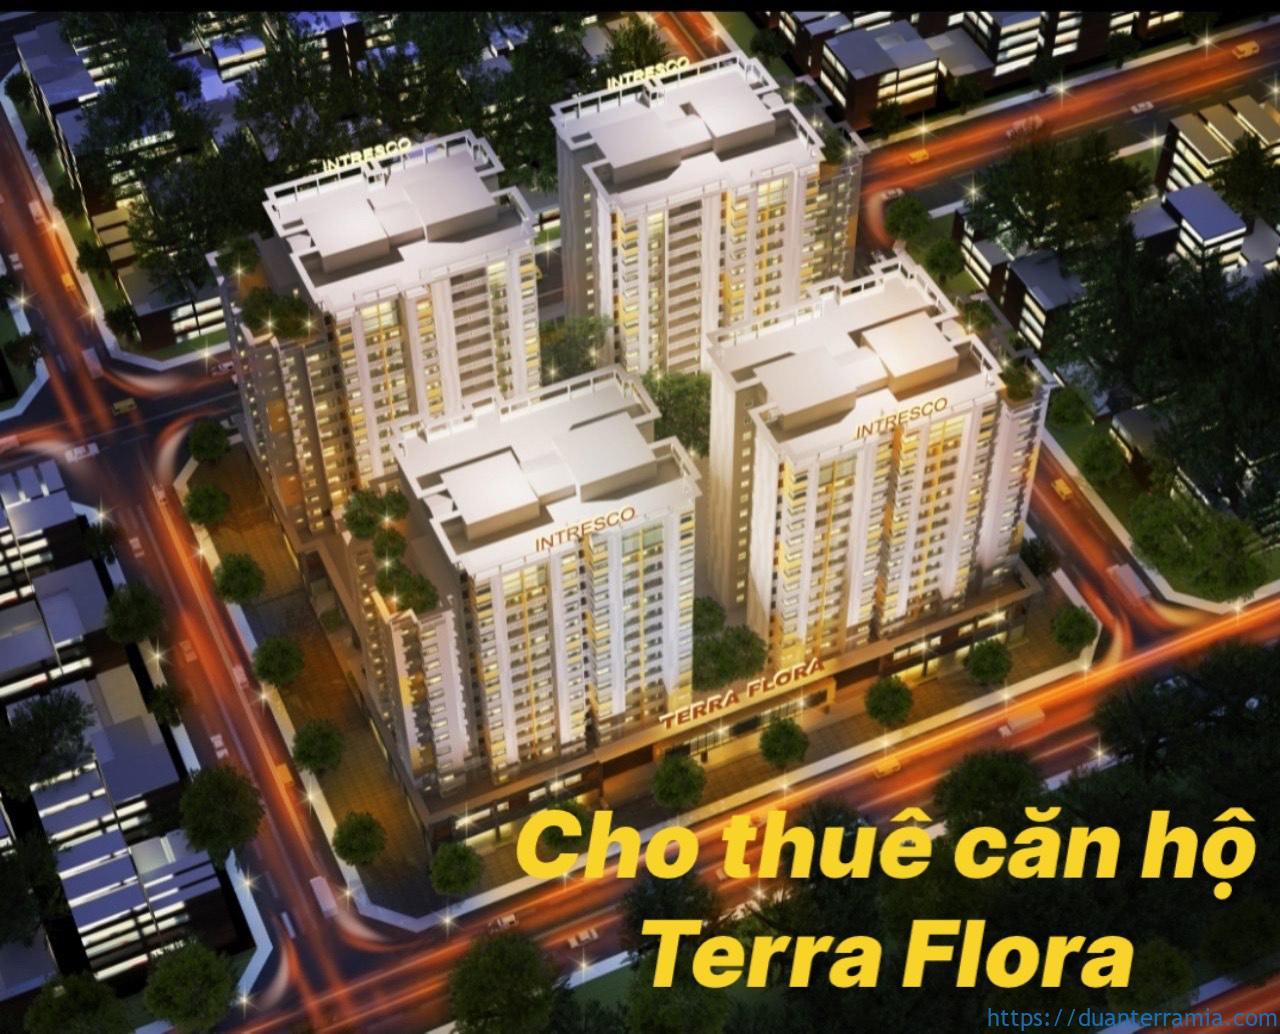 Cho thue can ho Terra Flora